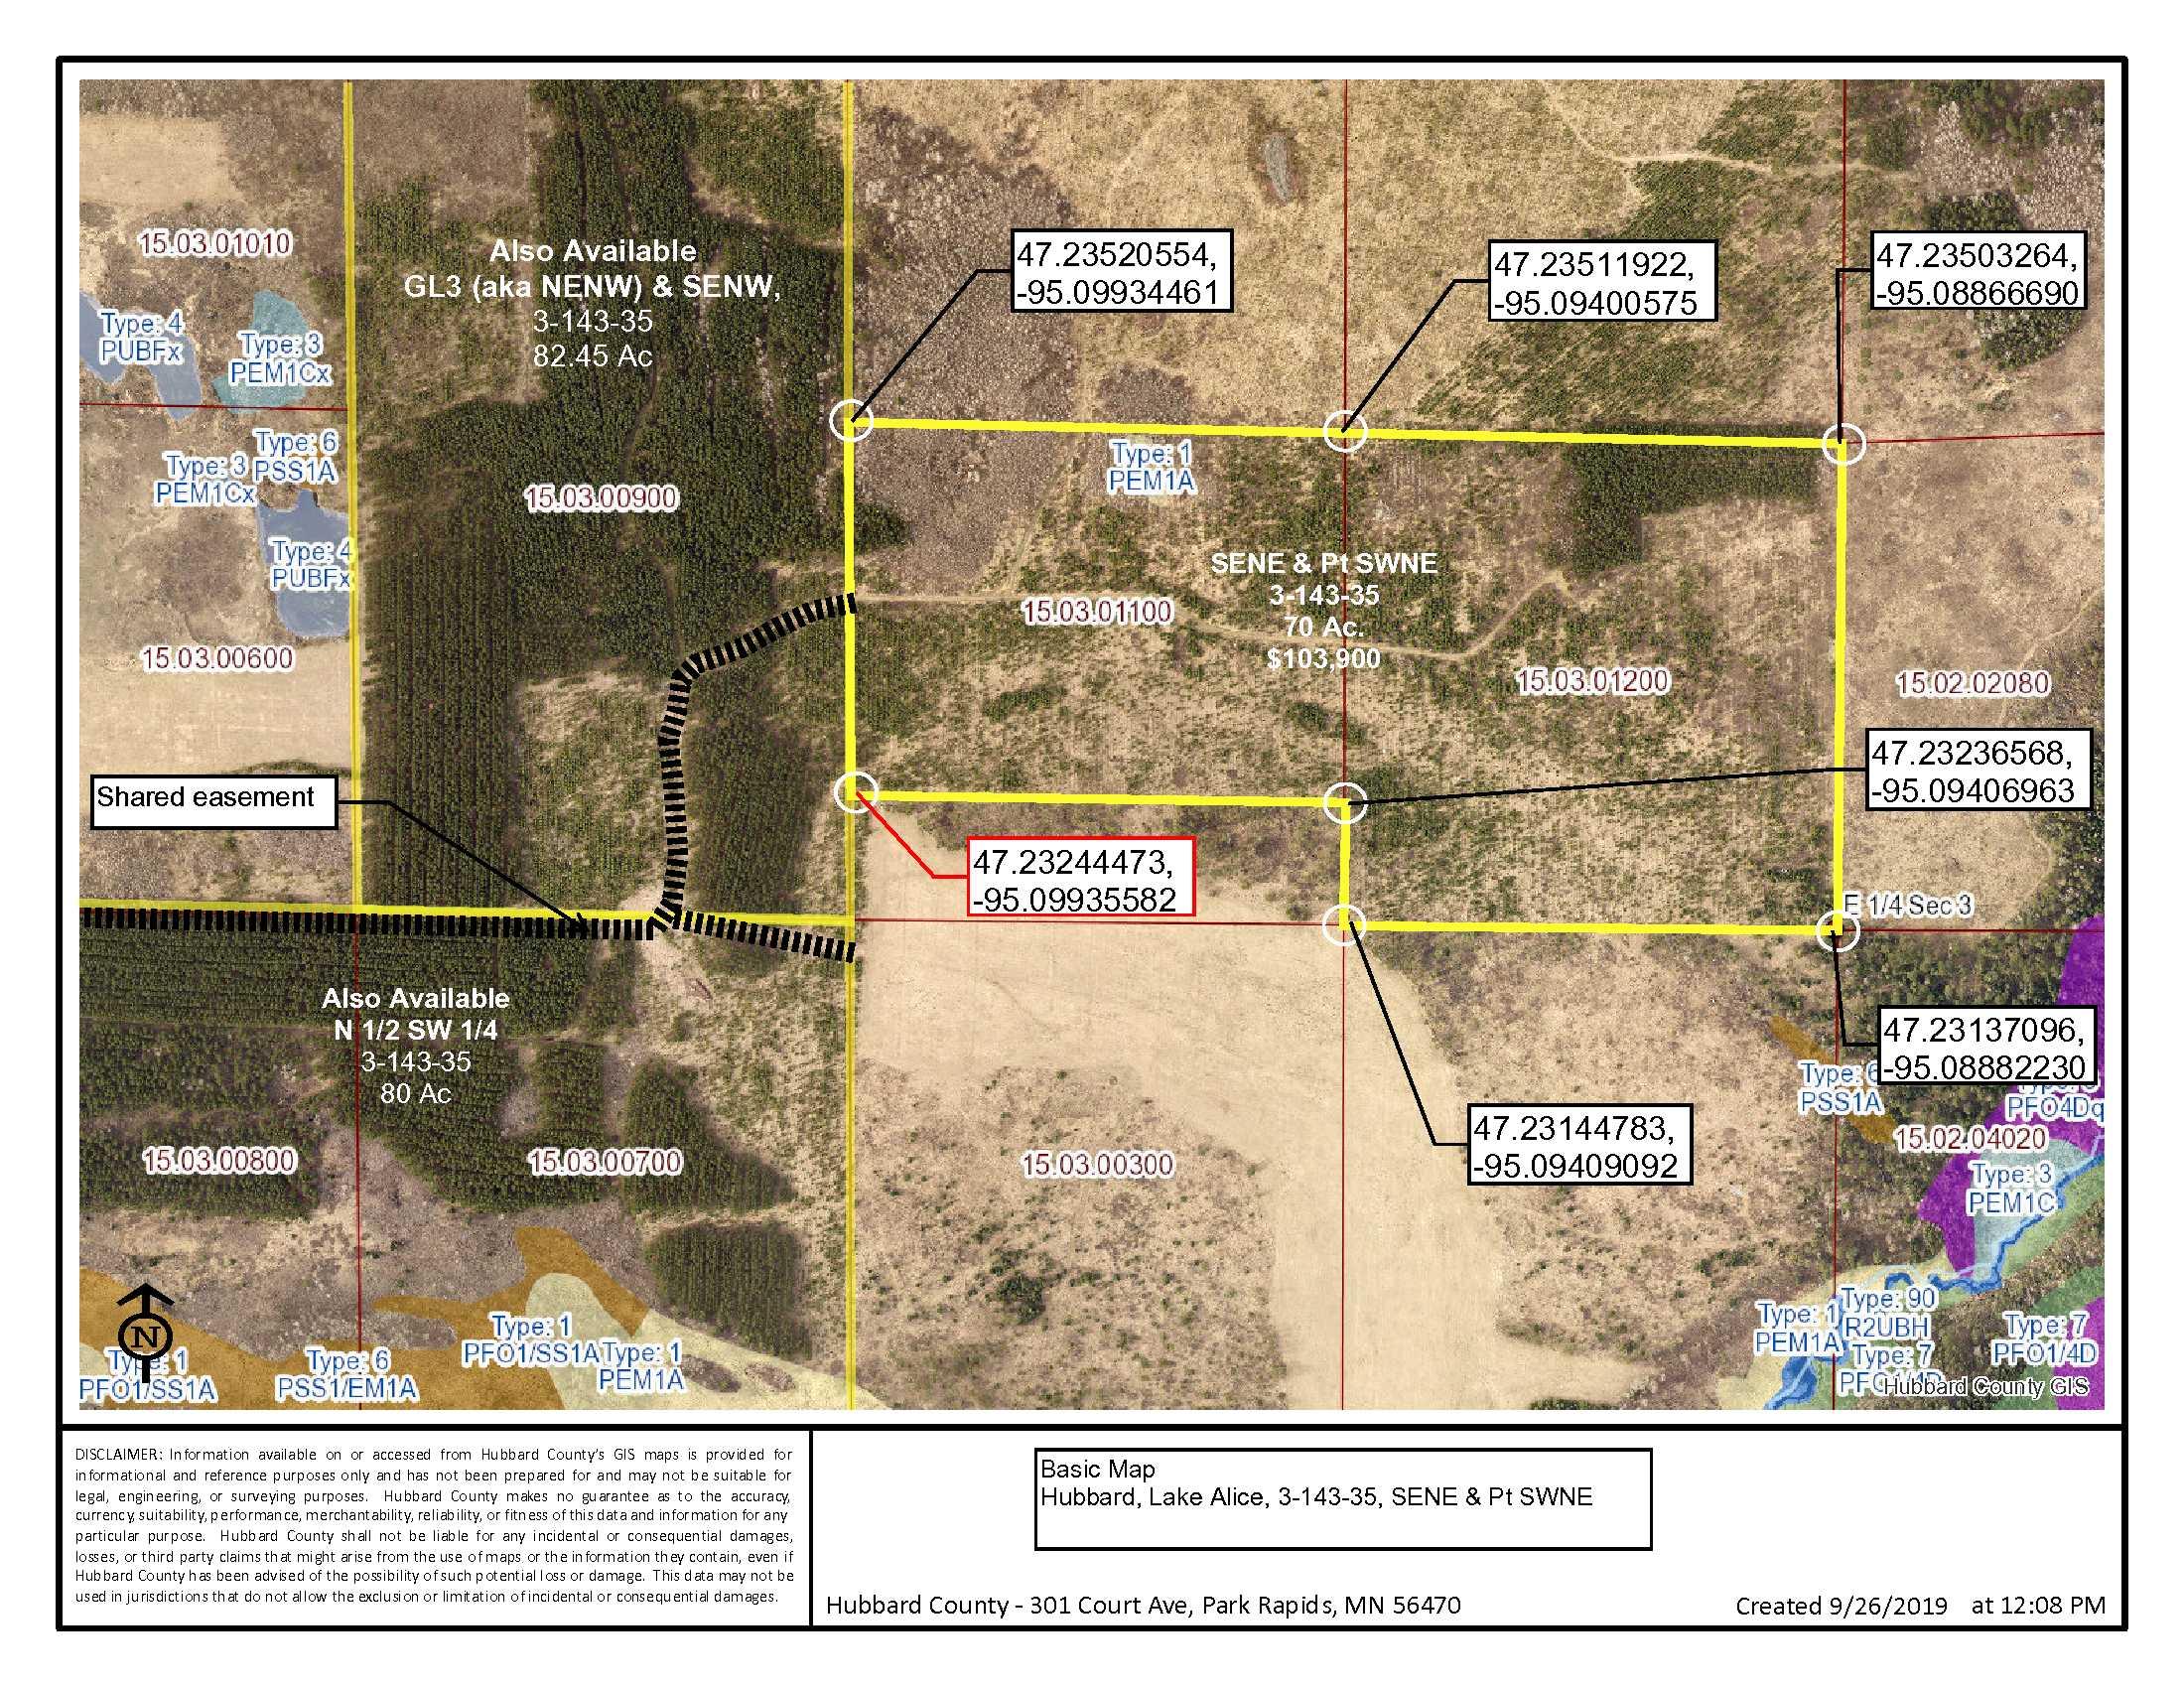 SENE & Pt SWNE, 03-143-35, Co Rd 3, Lake Alice Twp, Laporte, Hubbard Co